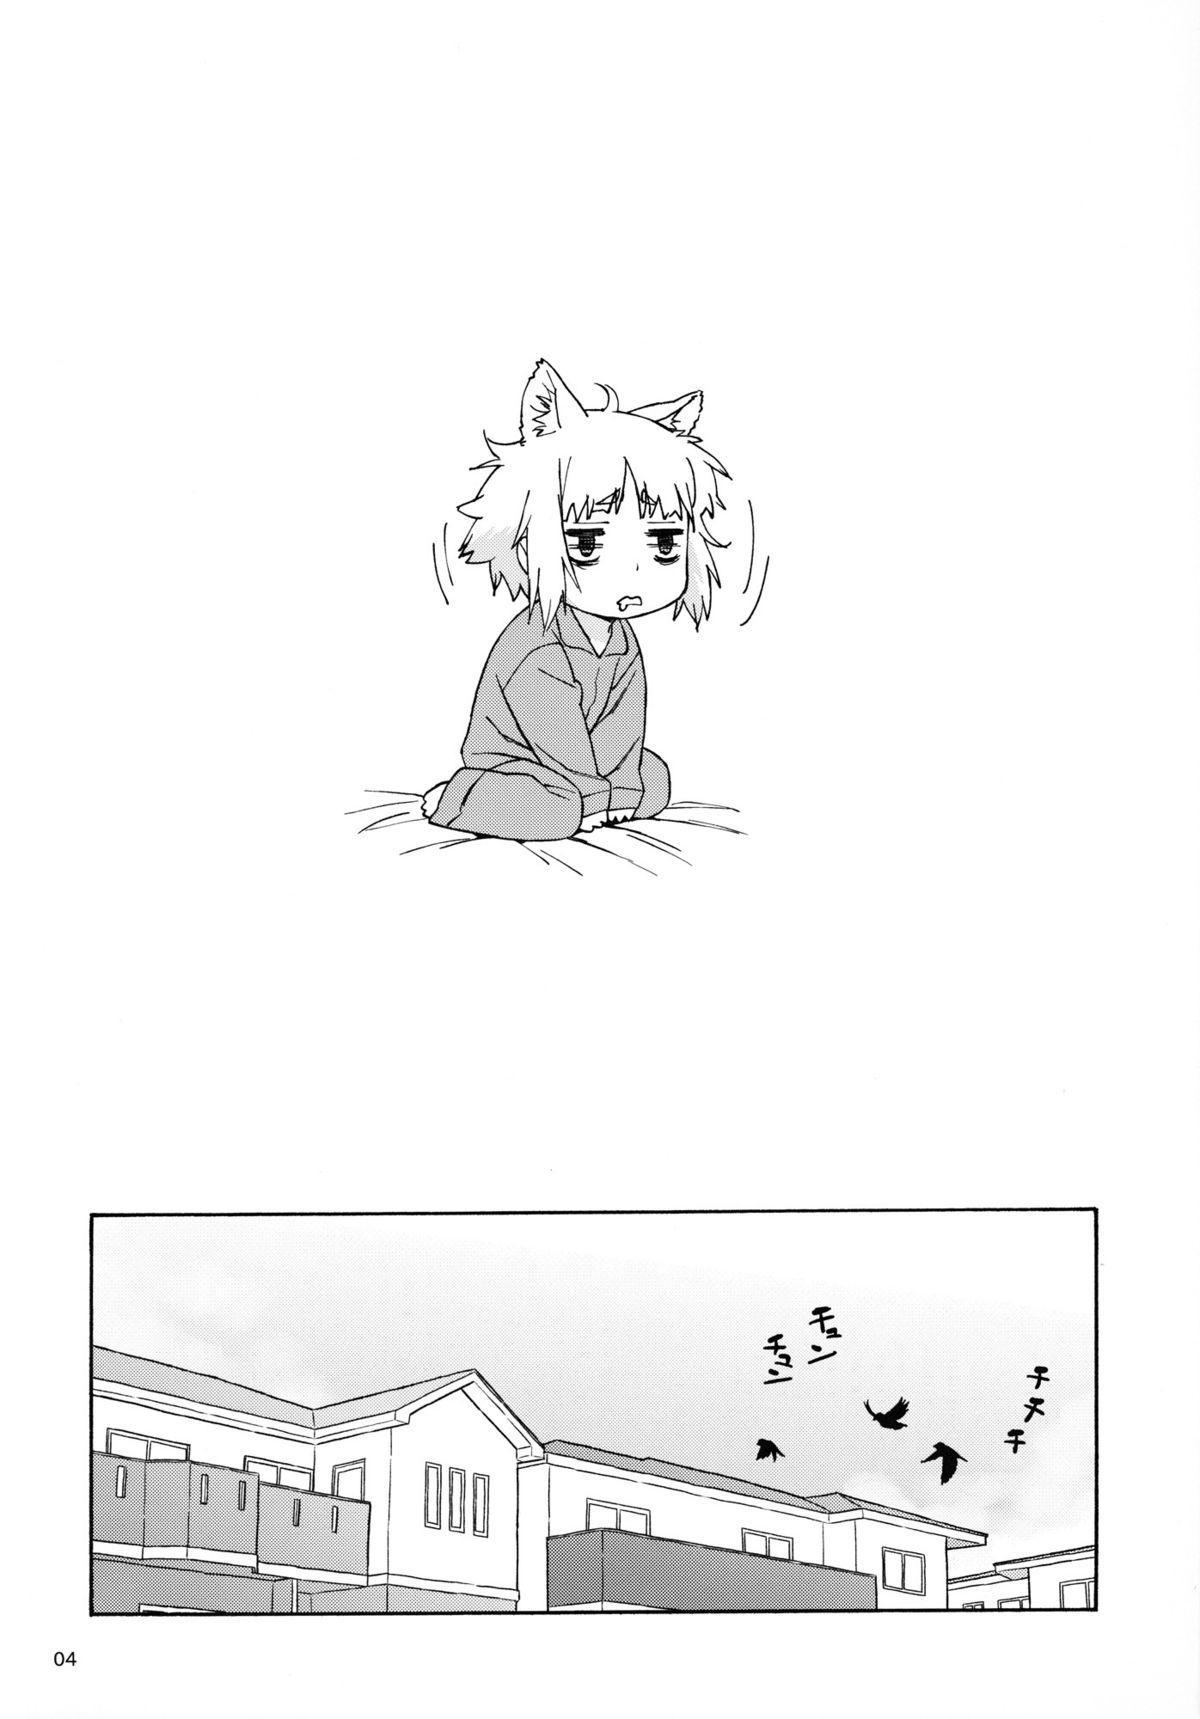 (C84) [666protect (Jingrock)] Doushichattano? Kagari-san | What Did I Do, Kagari-san? (Witch Craft Works) [English] {doujin-moe.us} 2